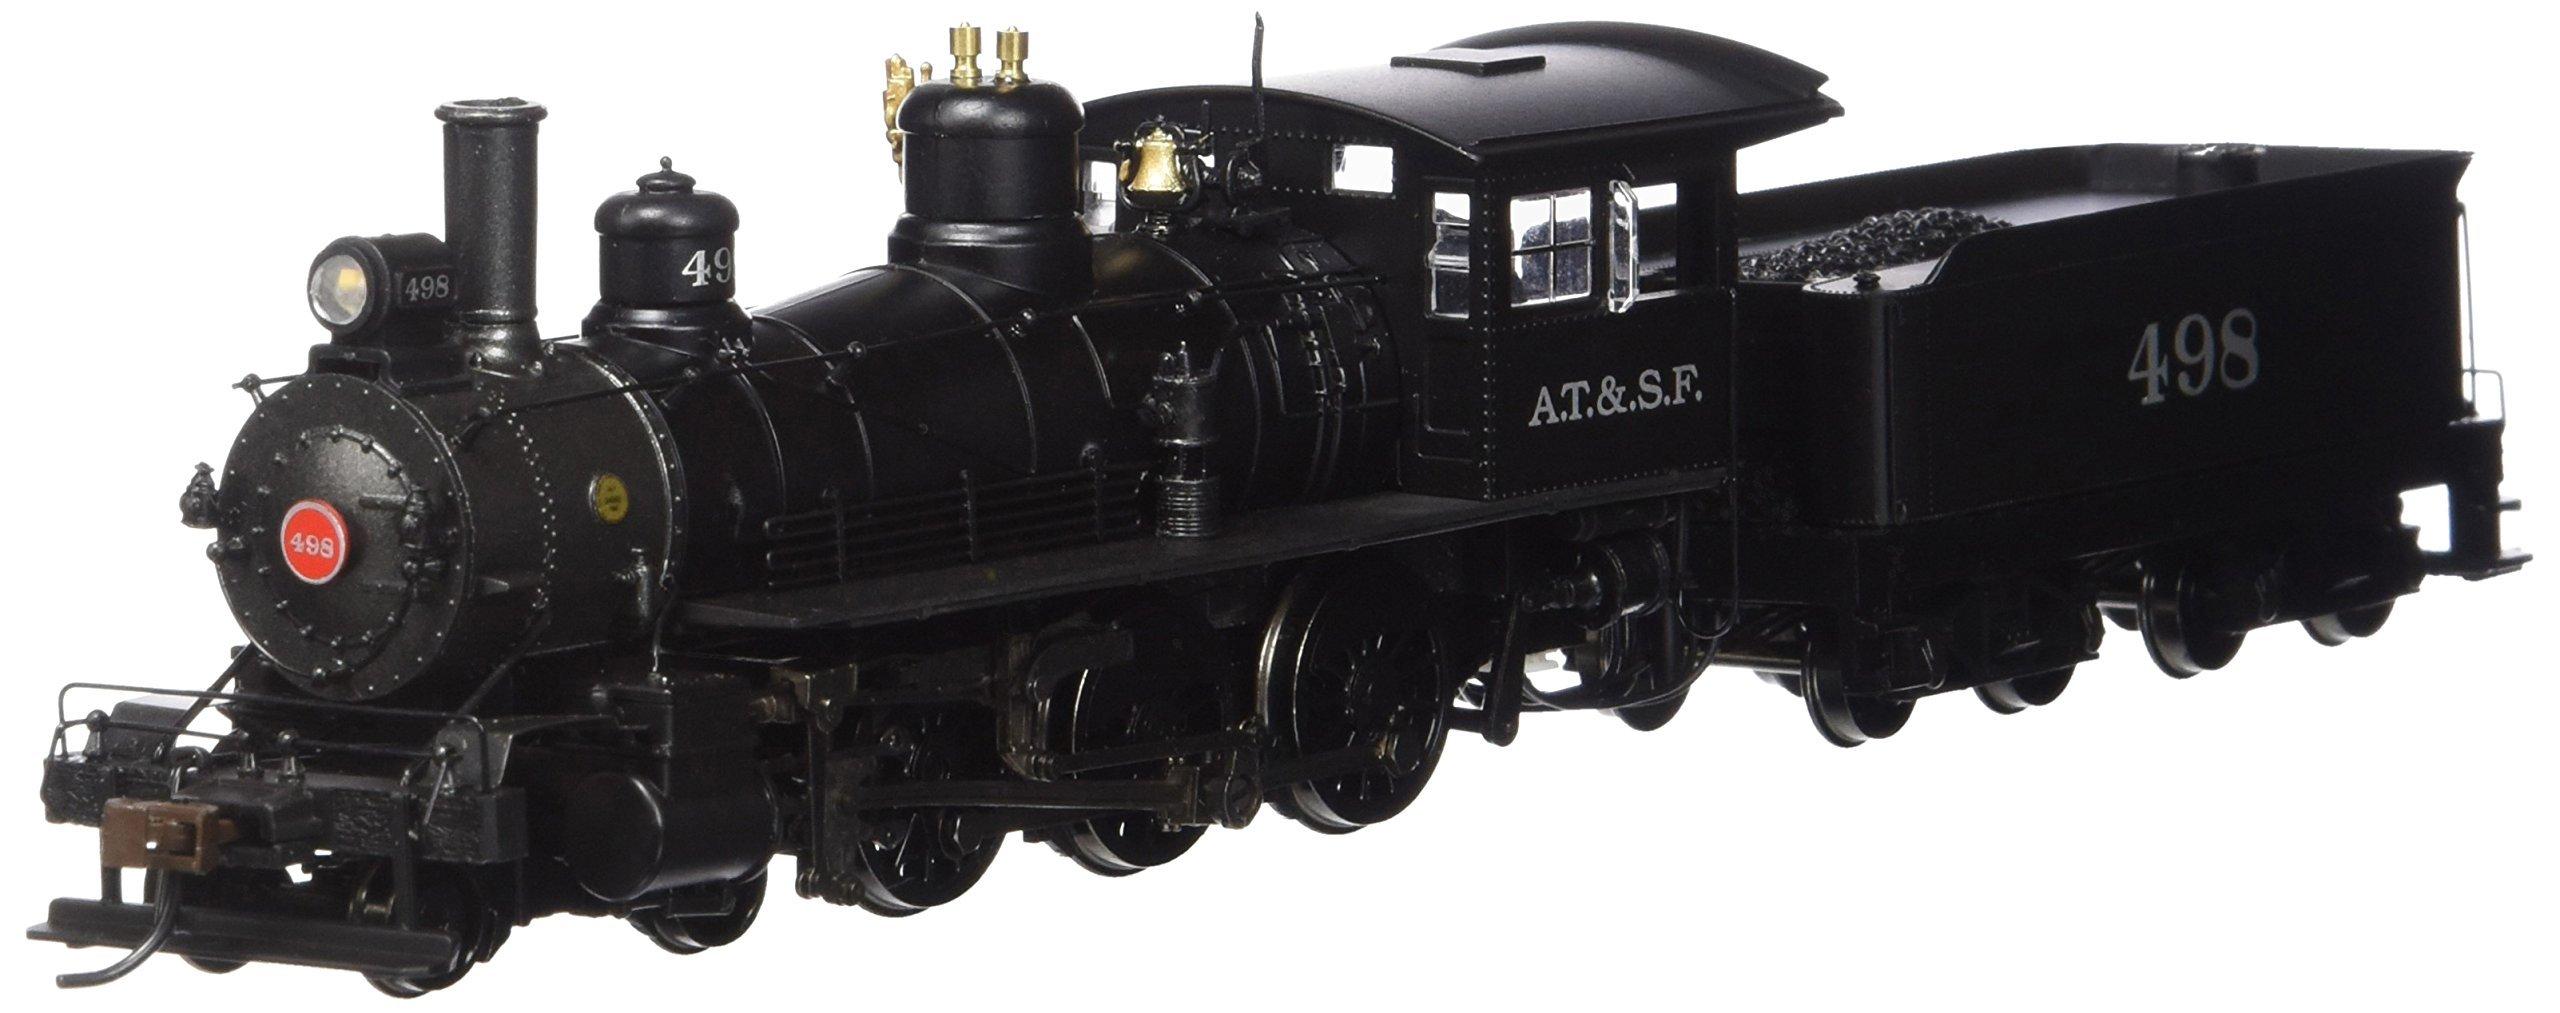 Bachmann Industries Baldwin 52'' Driver 4-6-0 DCC Sound Value Equipped Locomotive - SANTA FE #498 - (1:87 HO Scale)